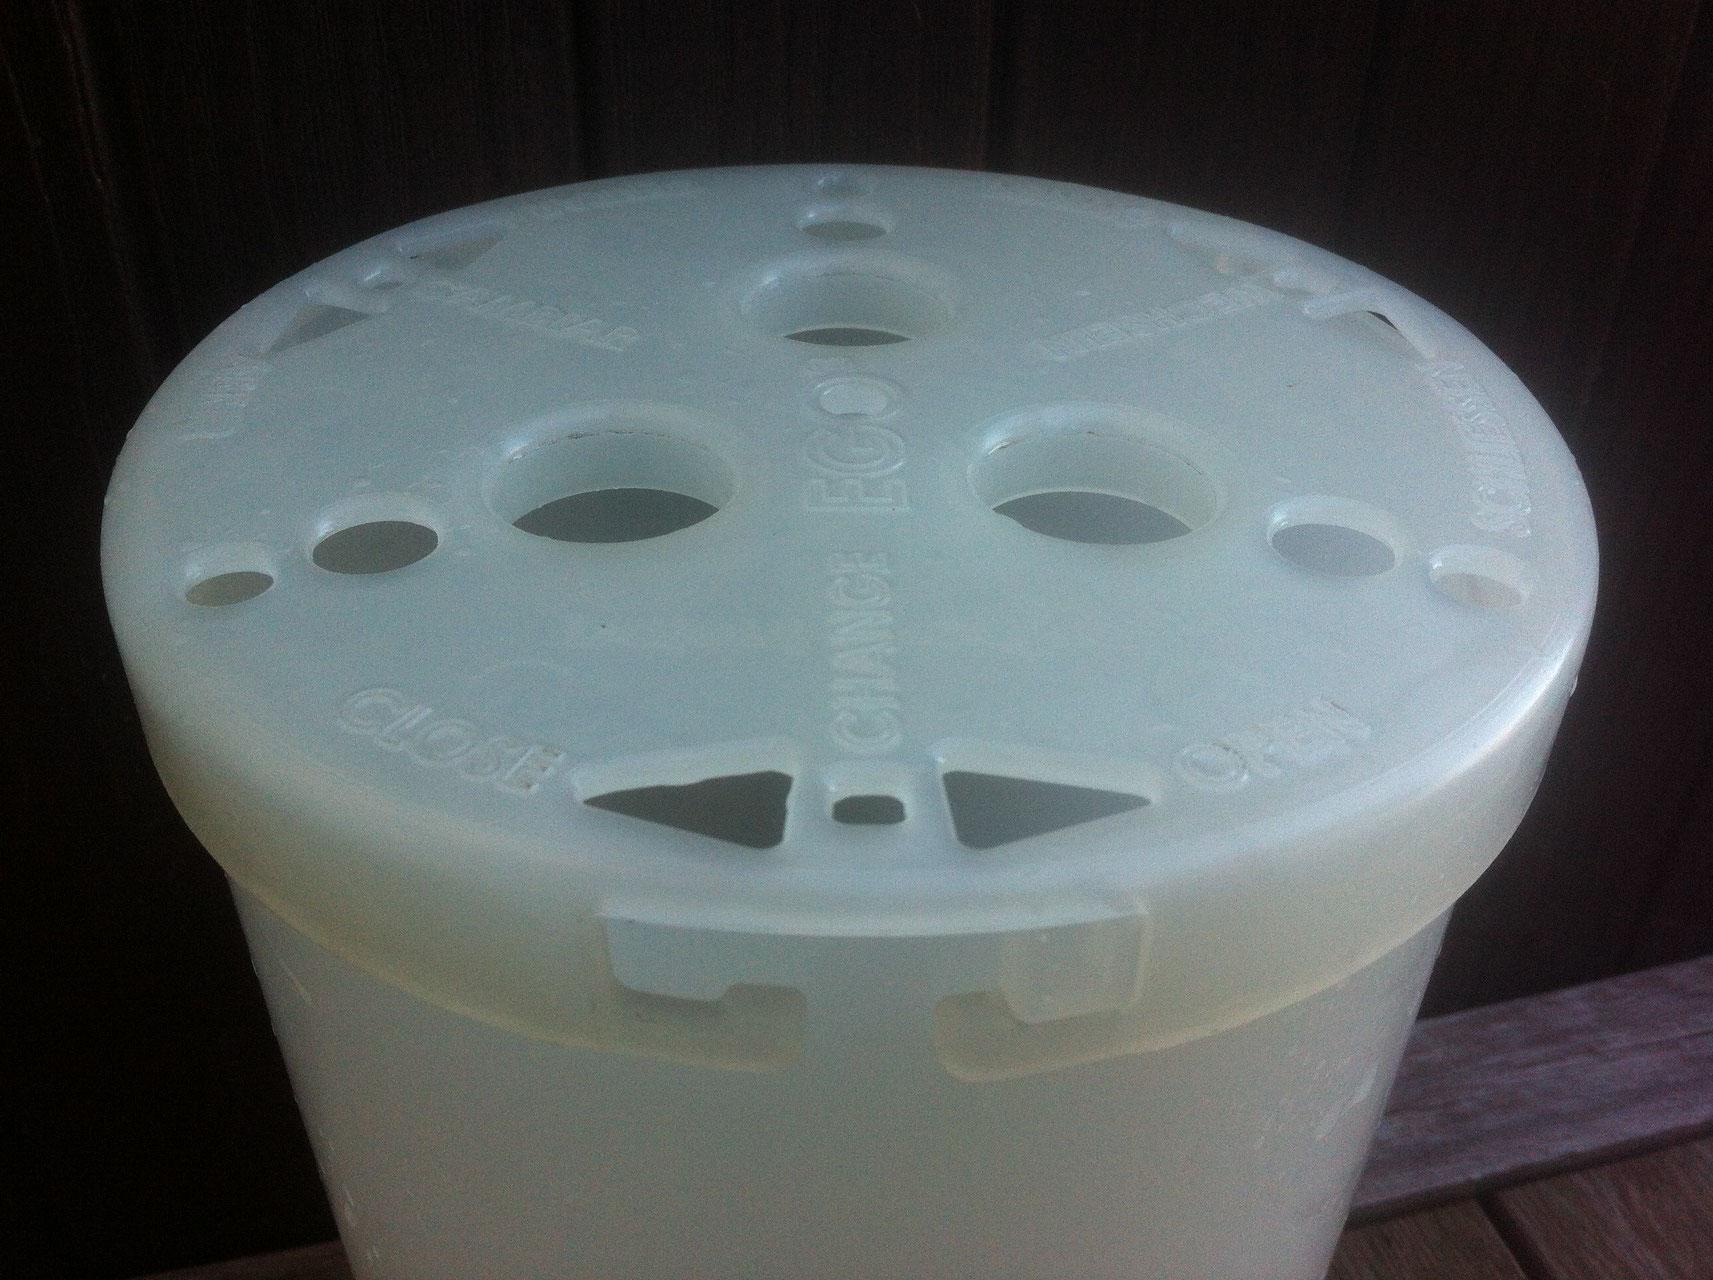 nie mehr whirlpool filter reinigen whirlpool filter. Black Bedroom Furniture Sets. Home Design Ideas